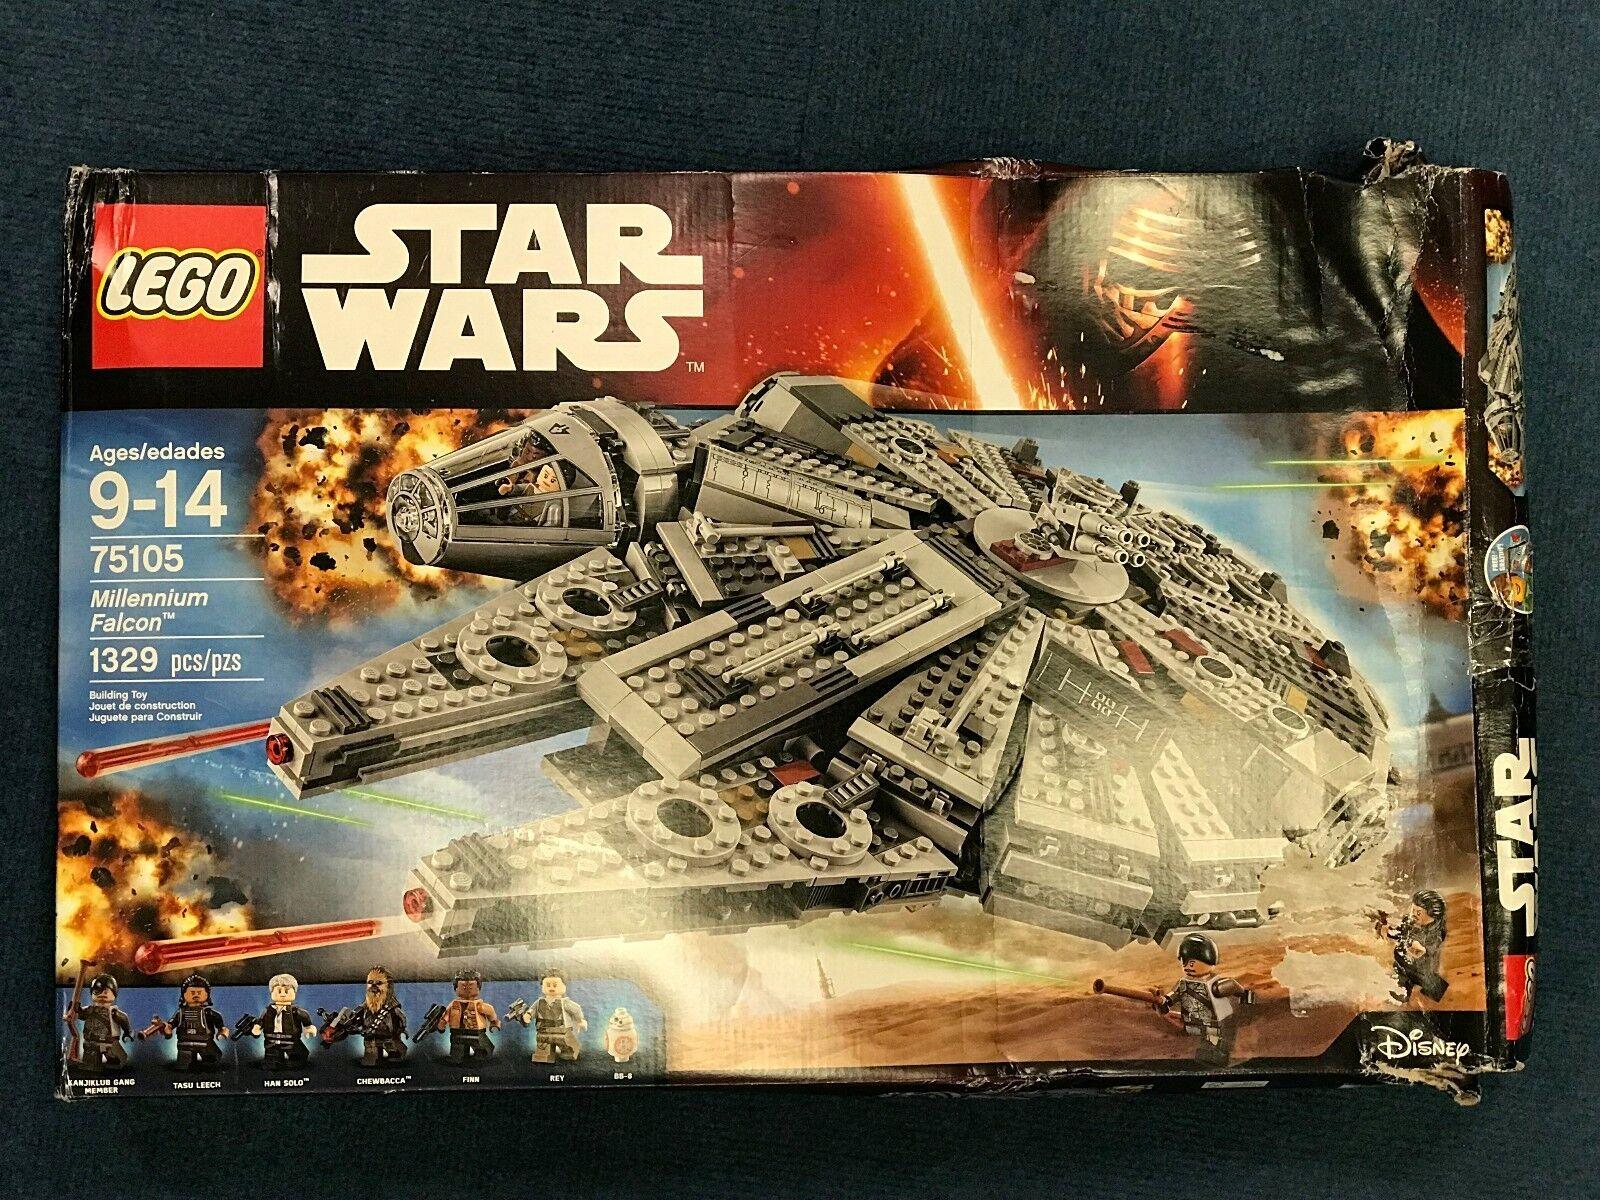 LEGO Star Wars Millennium Falcon 75105 1329 Pcs - Damaged Box - Sealed Bags READ